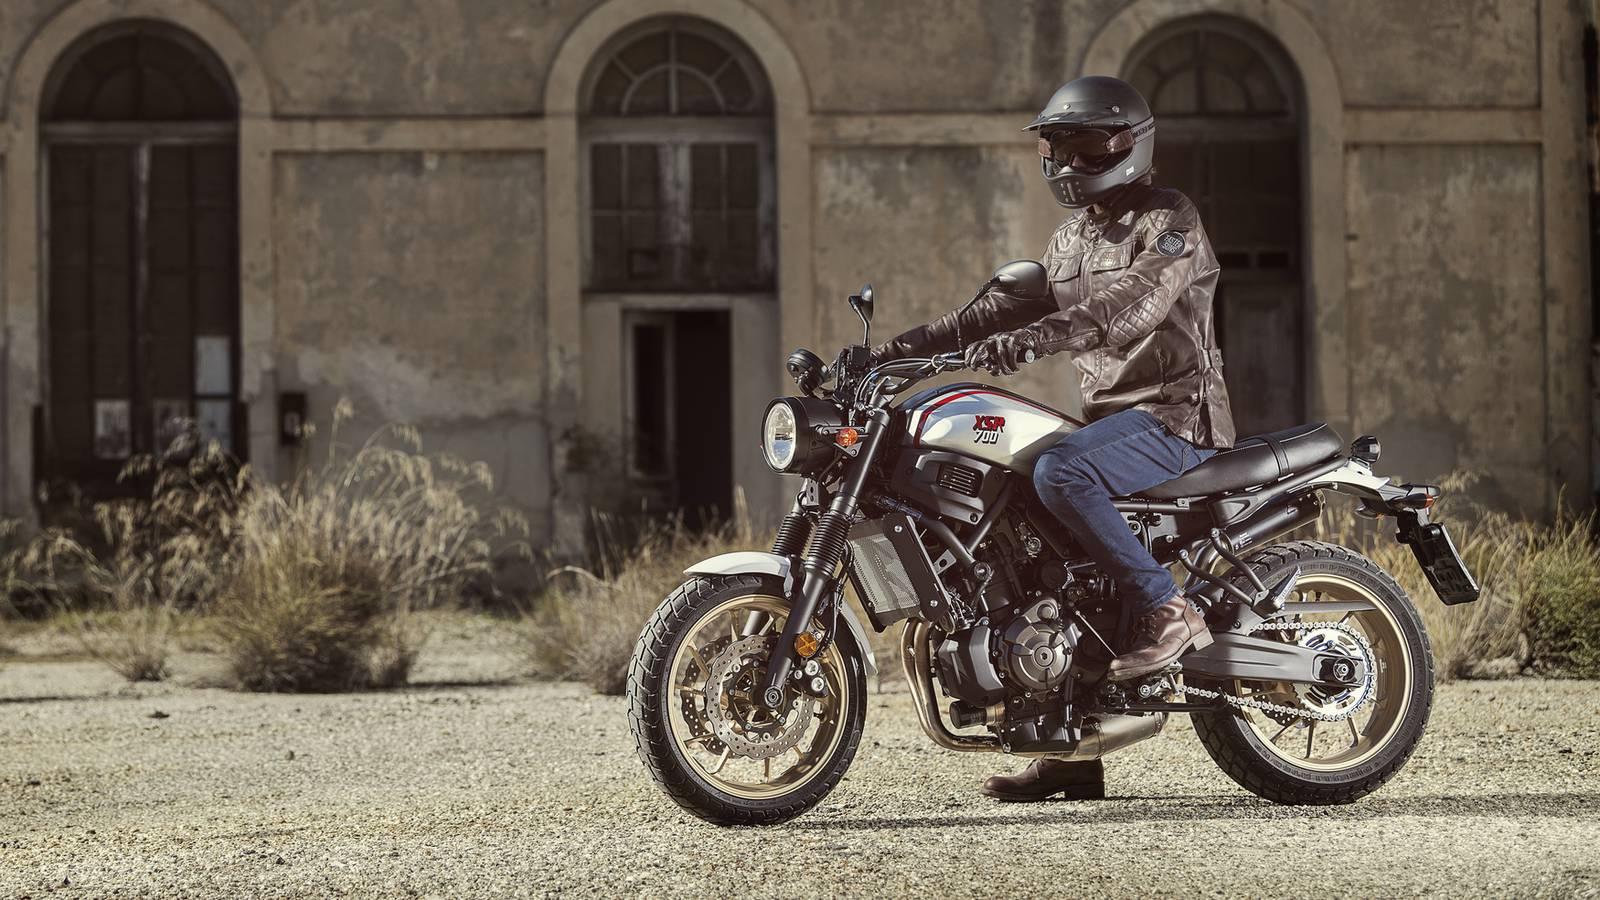 Eines der vielen Yamaha-Modellen bei Rüegg Motos (© Rüegg Motos GmbH)